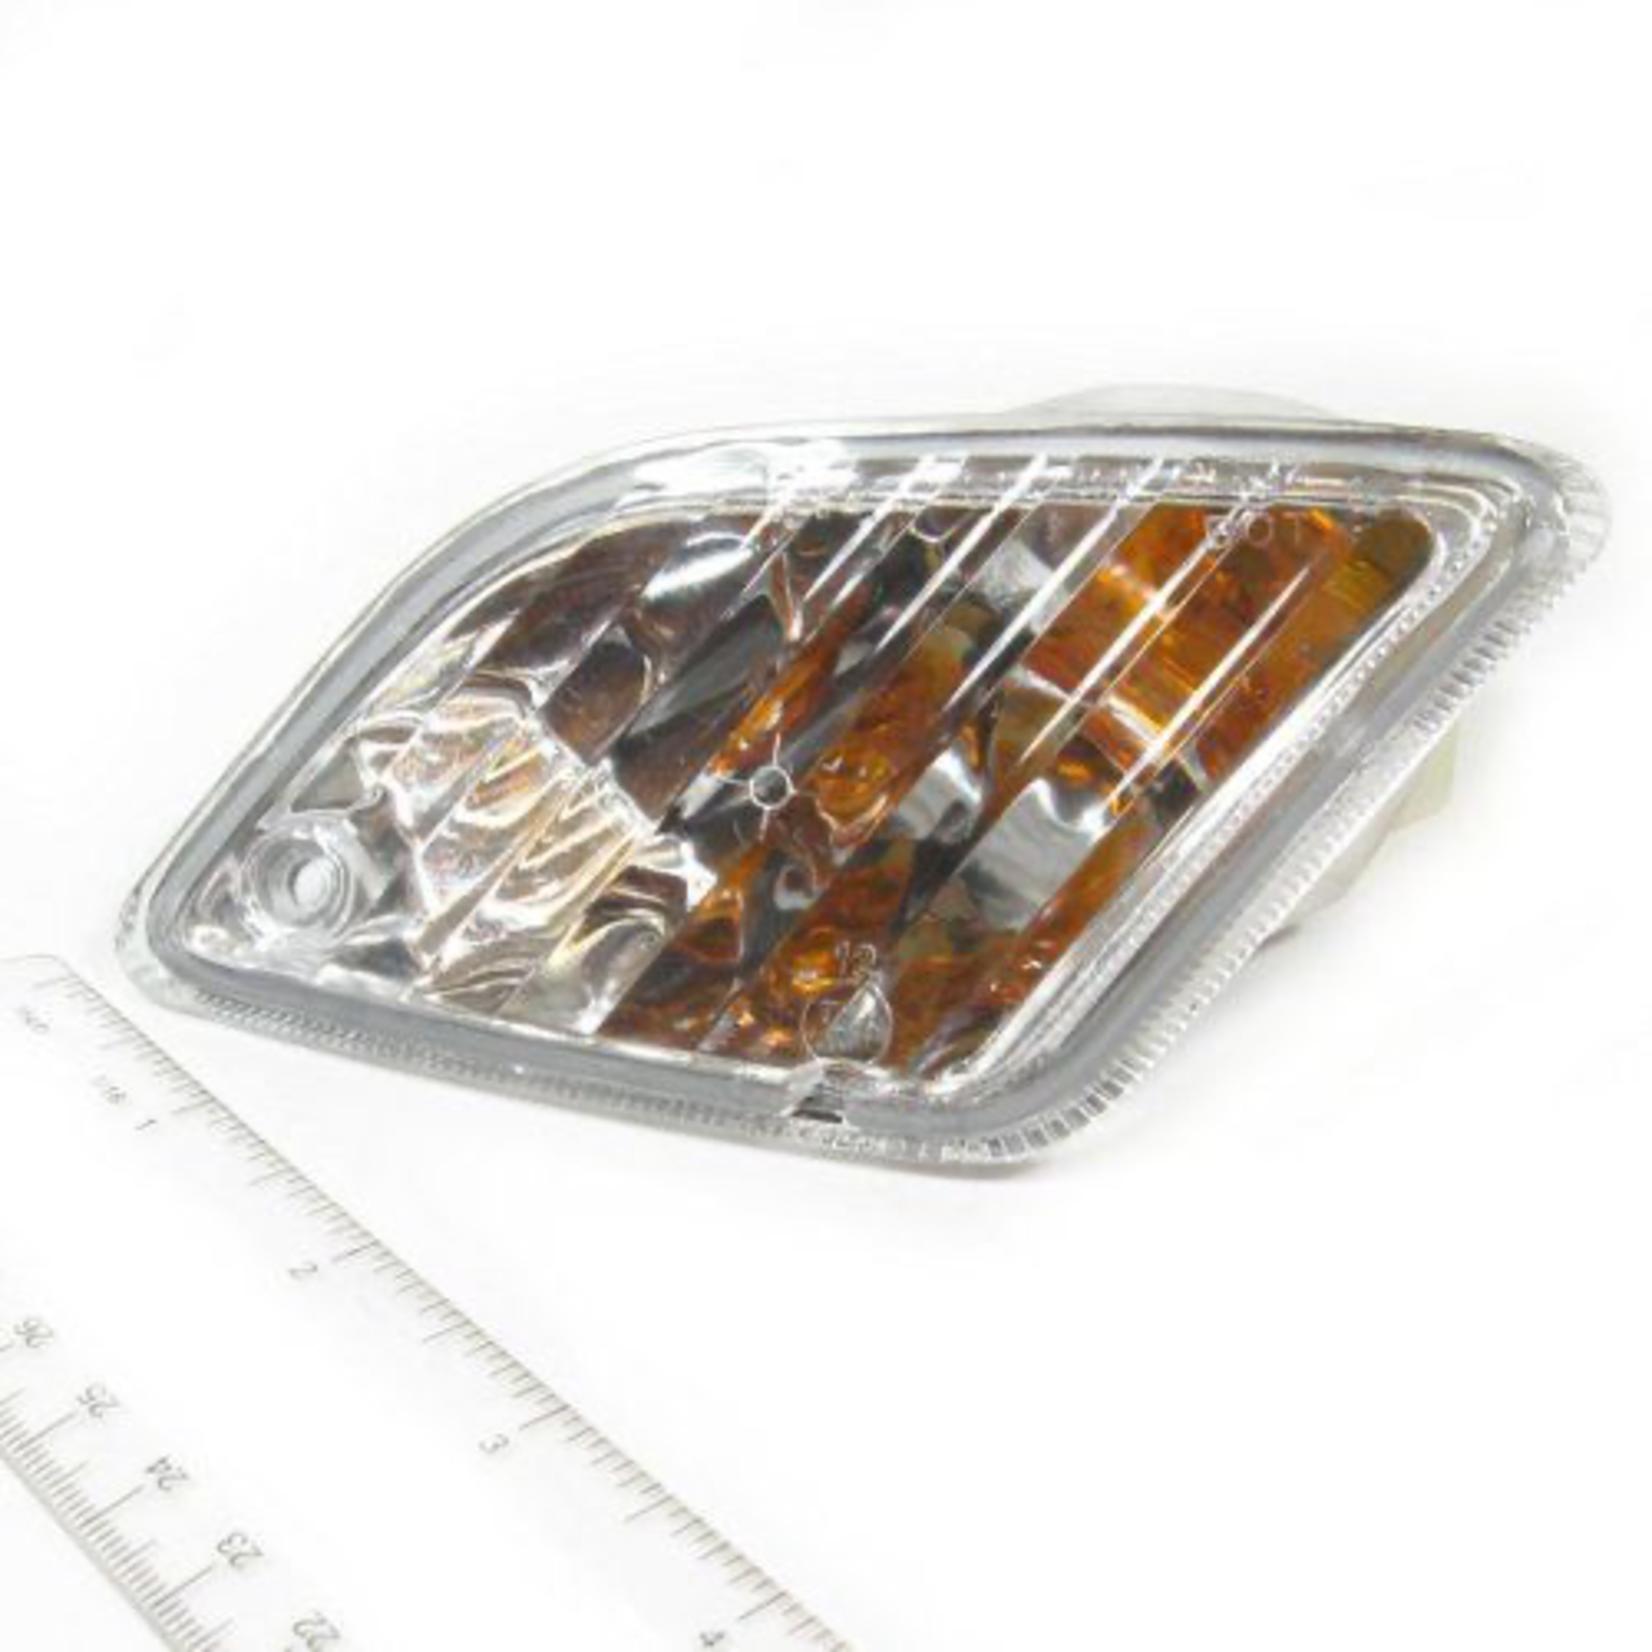 Parts Signal Lamp, RH Rear GT/GTS (584972)